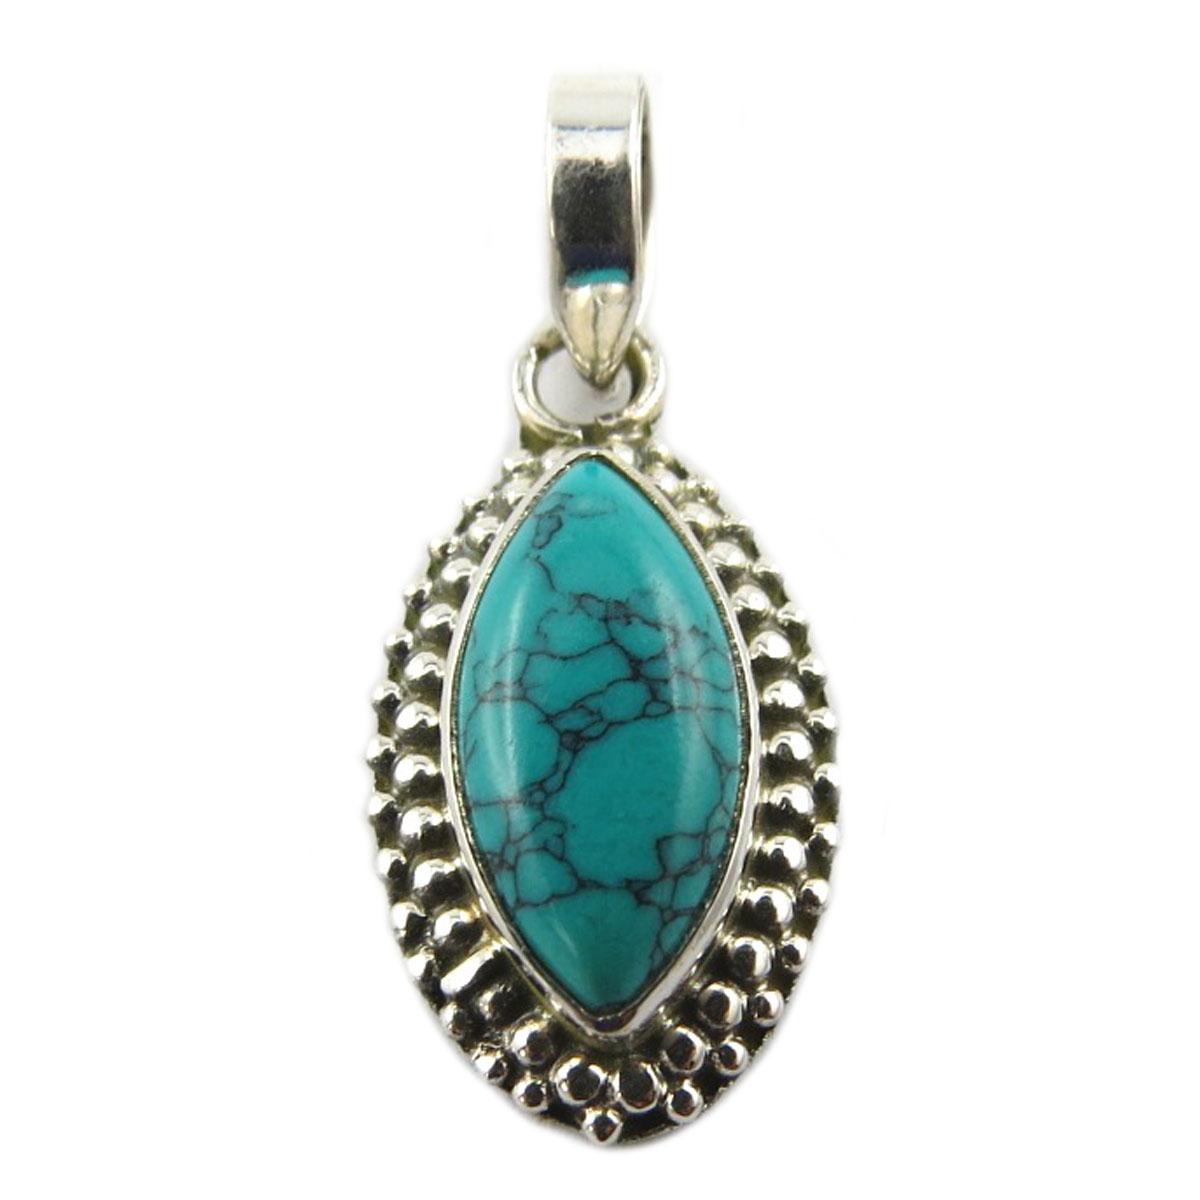 Pendentif Argent artisanal \'Heaven\' turquoise - 18x12 mm - [Q9886]